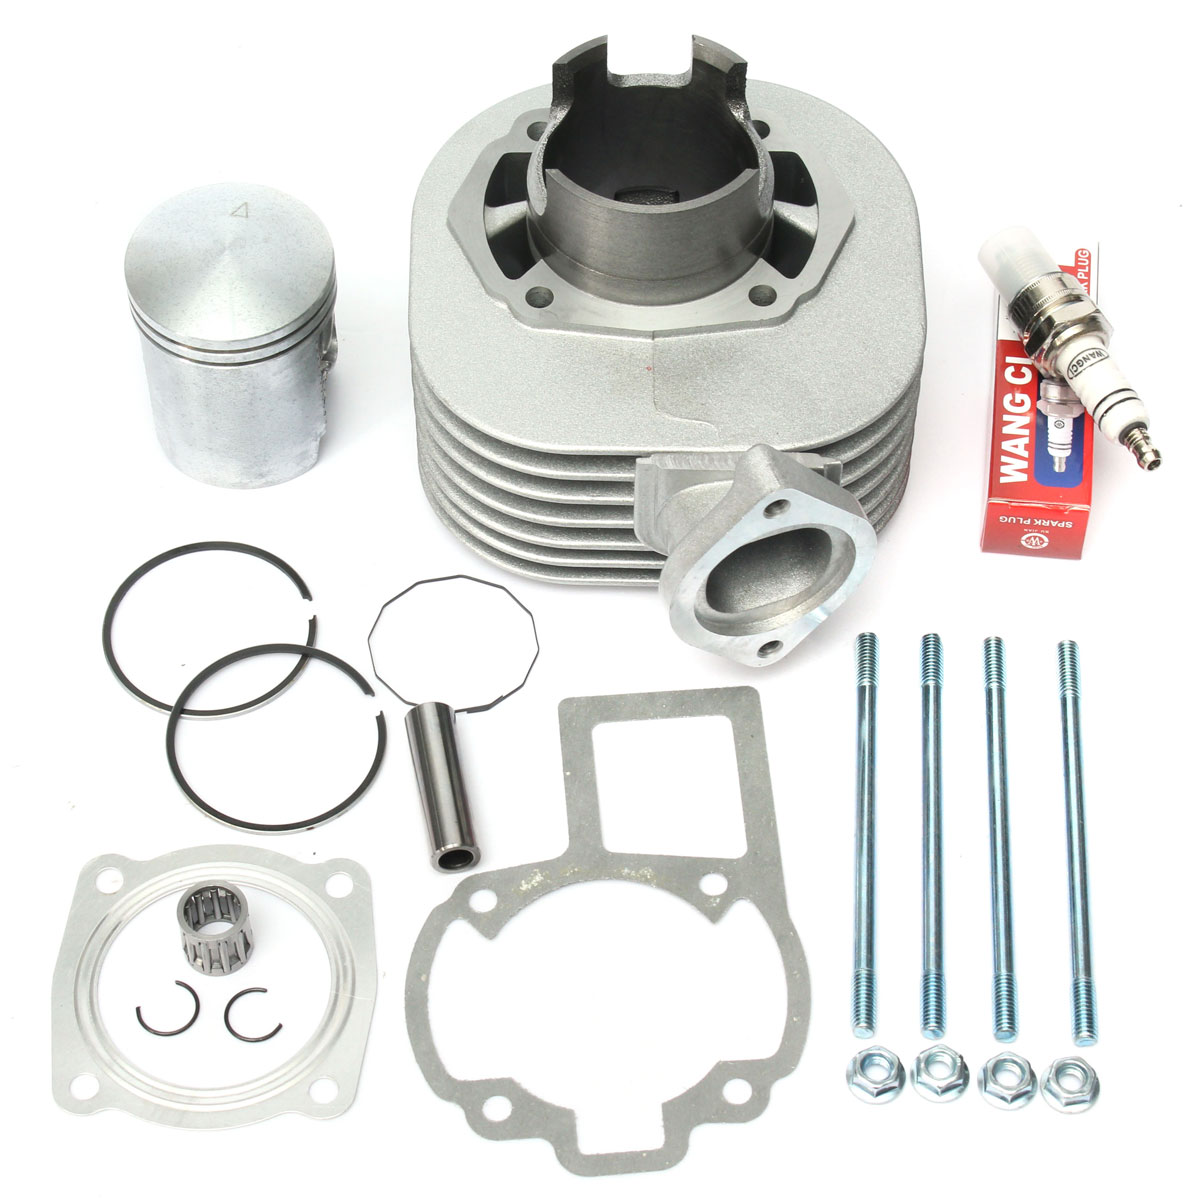 Cylinder Piston Kit Rings Gasket Pin Top End Set For SUZUKI LT 80 LT80 1987-2006 11210-40B01